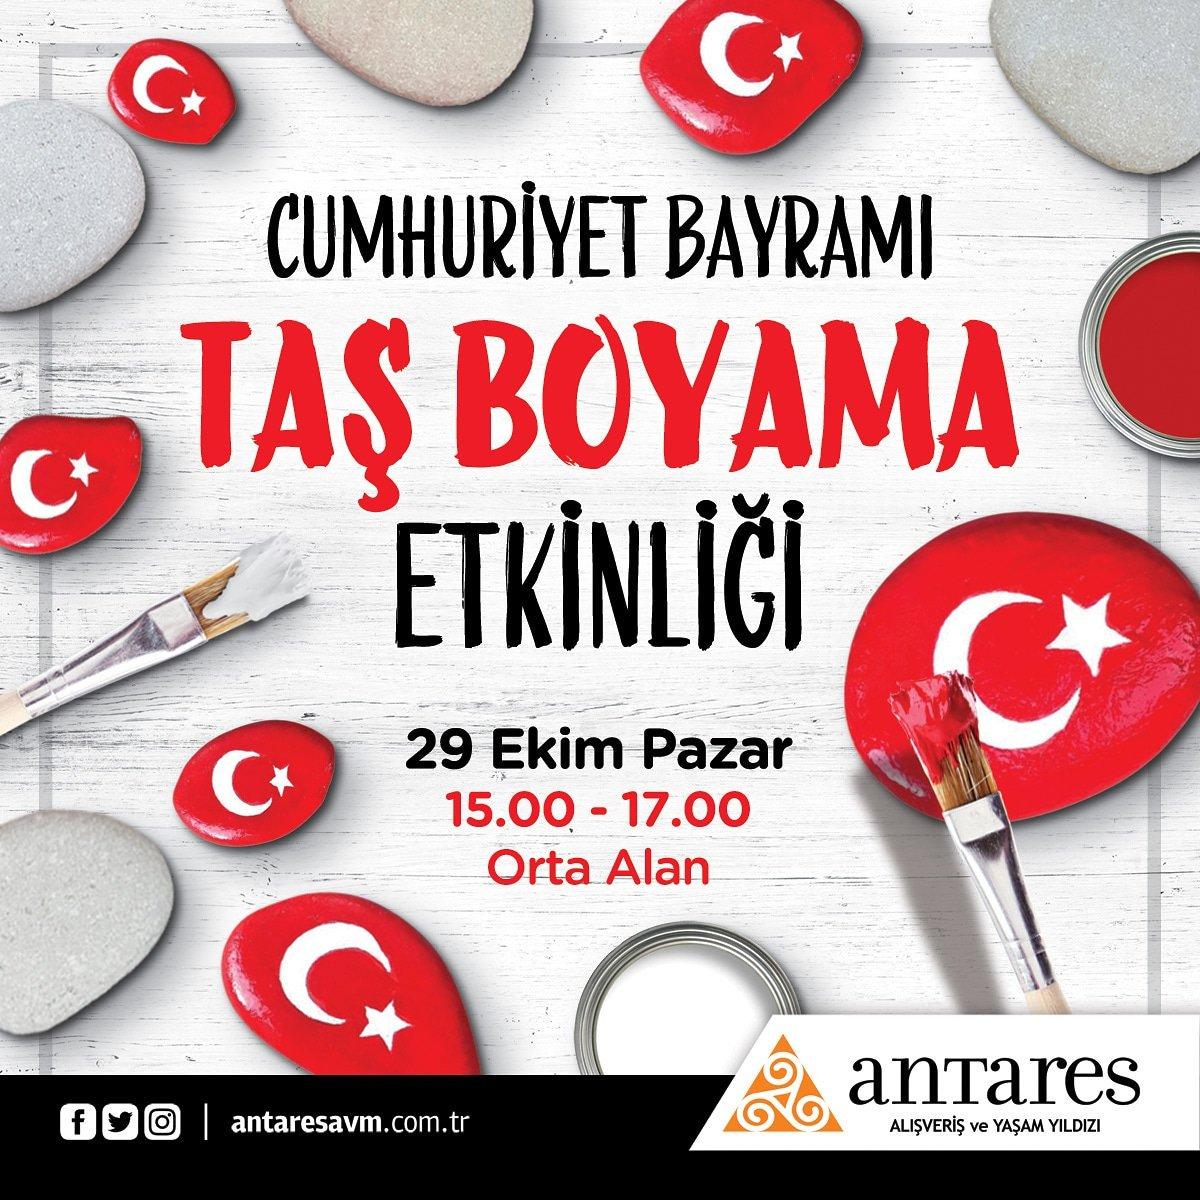 Antares Avm On Twitter Cumhuriyet Bayrami Tas Boyama Etkinligi